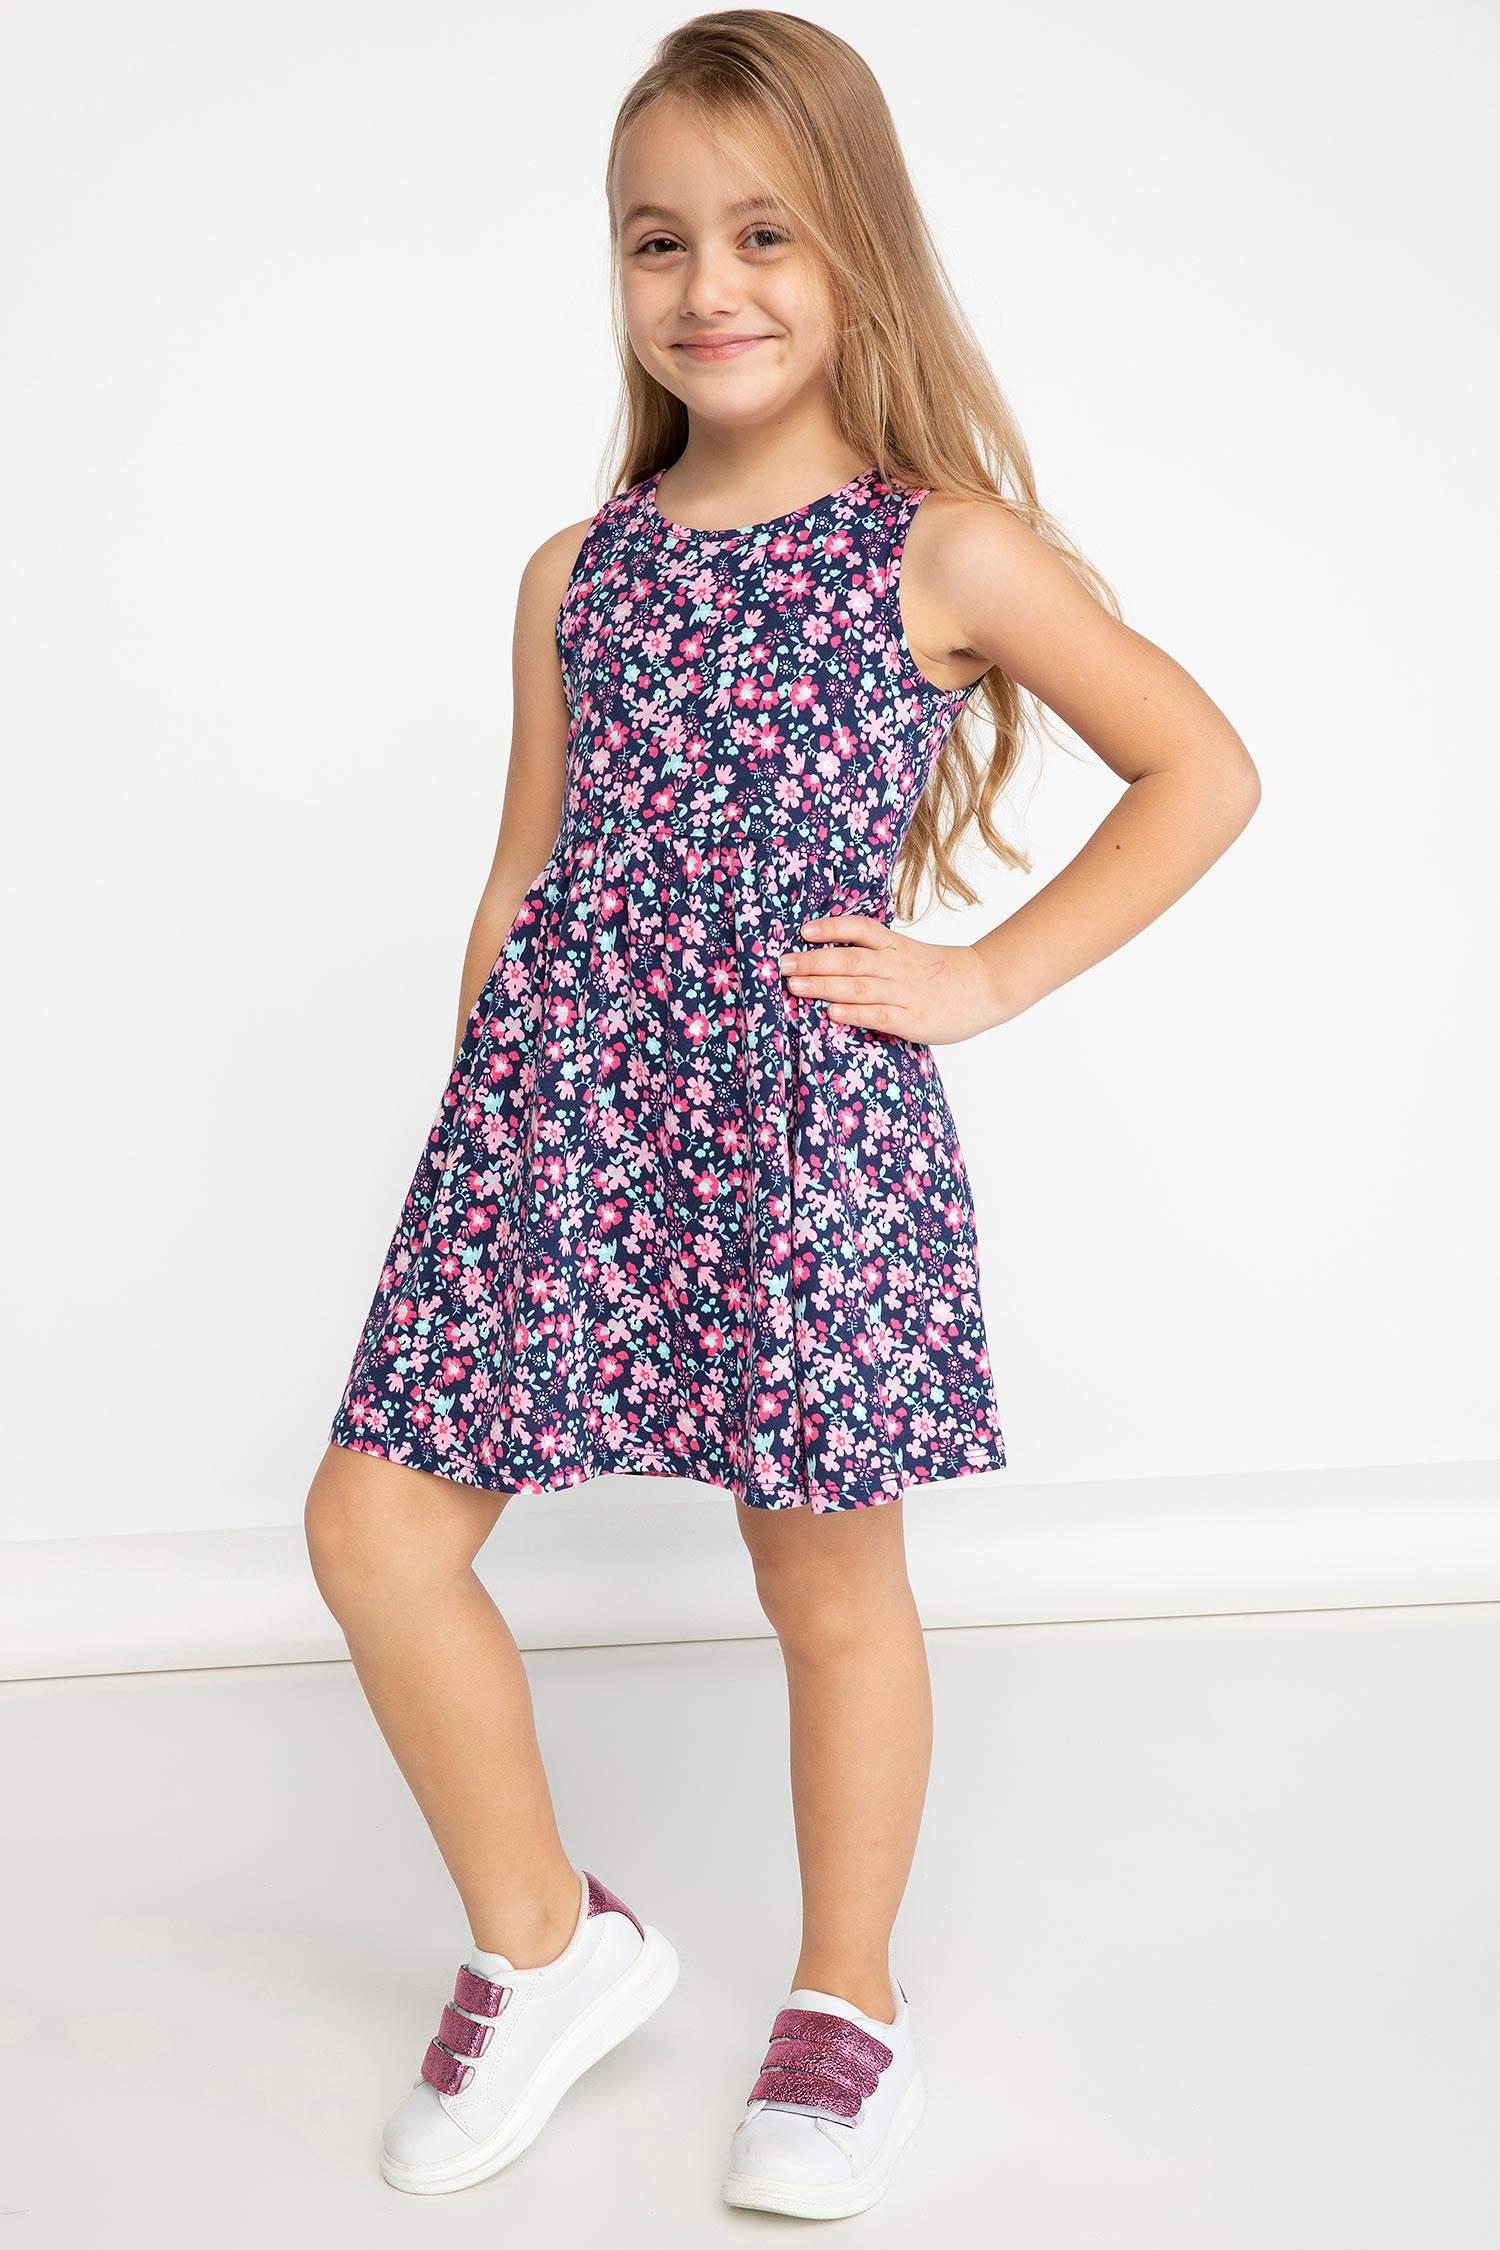 5b11353191585 Lacivert Kız Çocuk - Genç Kız Çiçekli Elbise 944184 | DeFacto